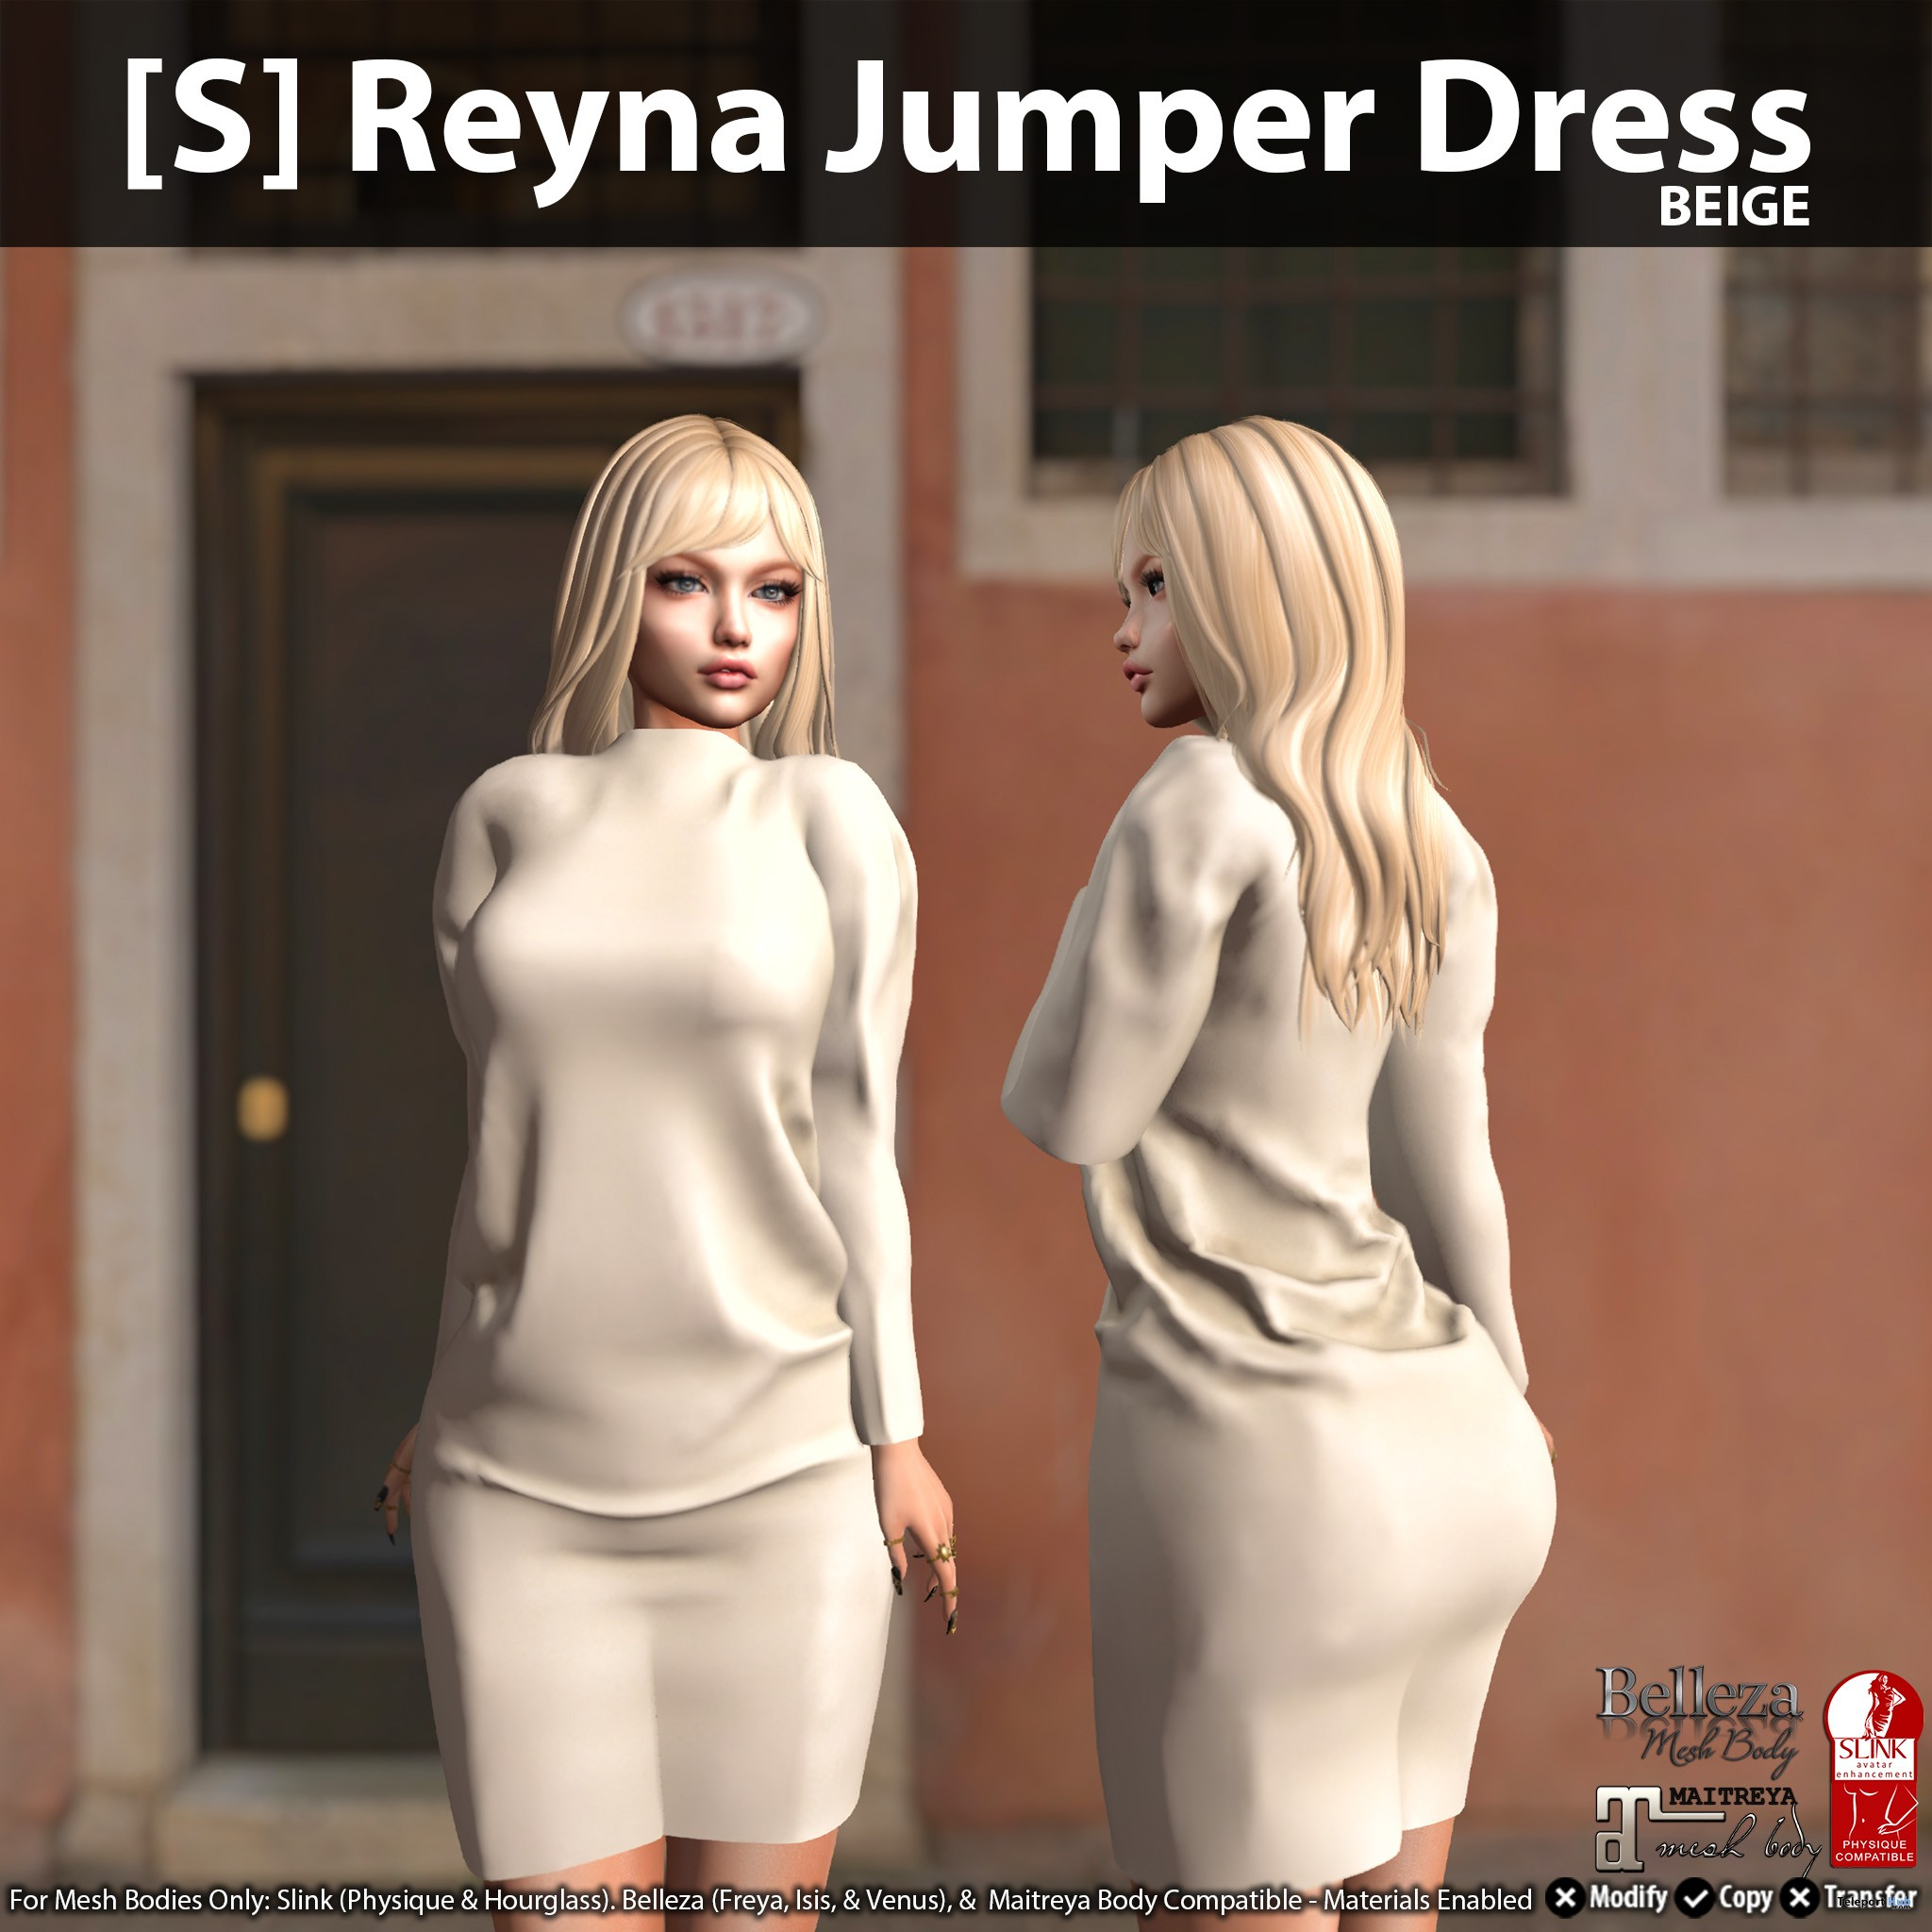 New Release: [S] Reyna Jumper Dress by [satus Inc] - Teleport Hub - teleporthub.com